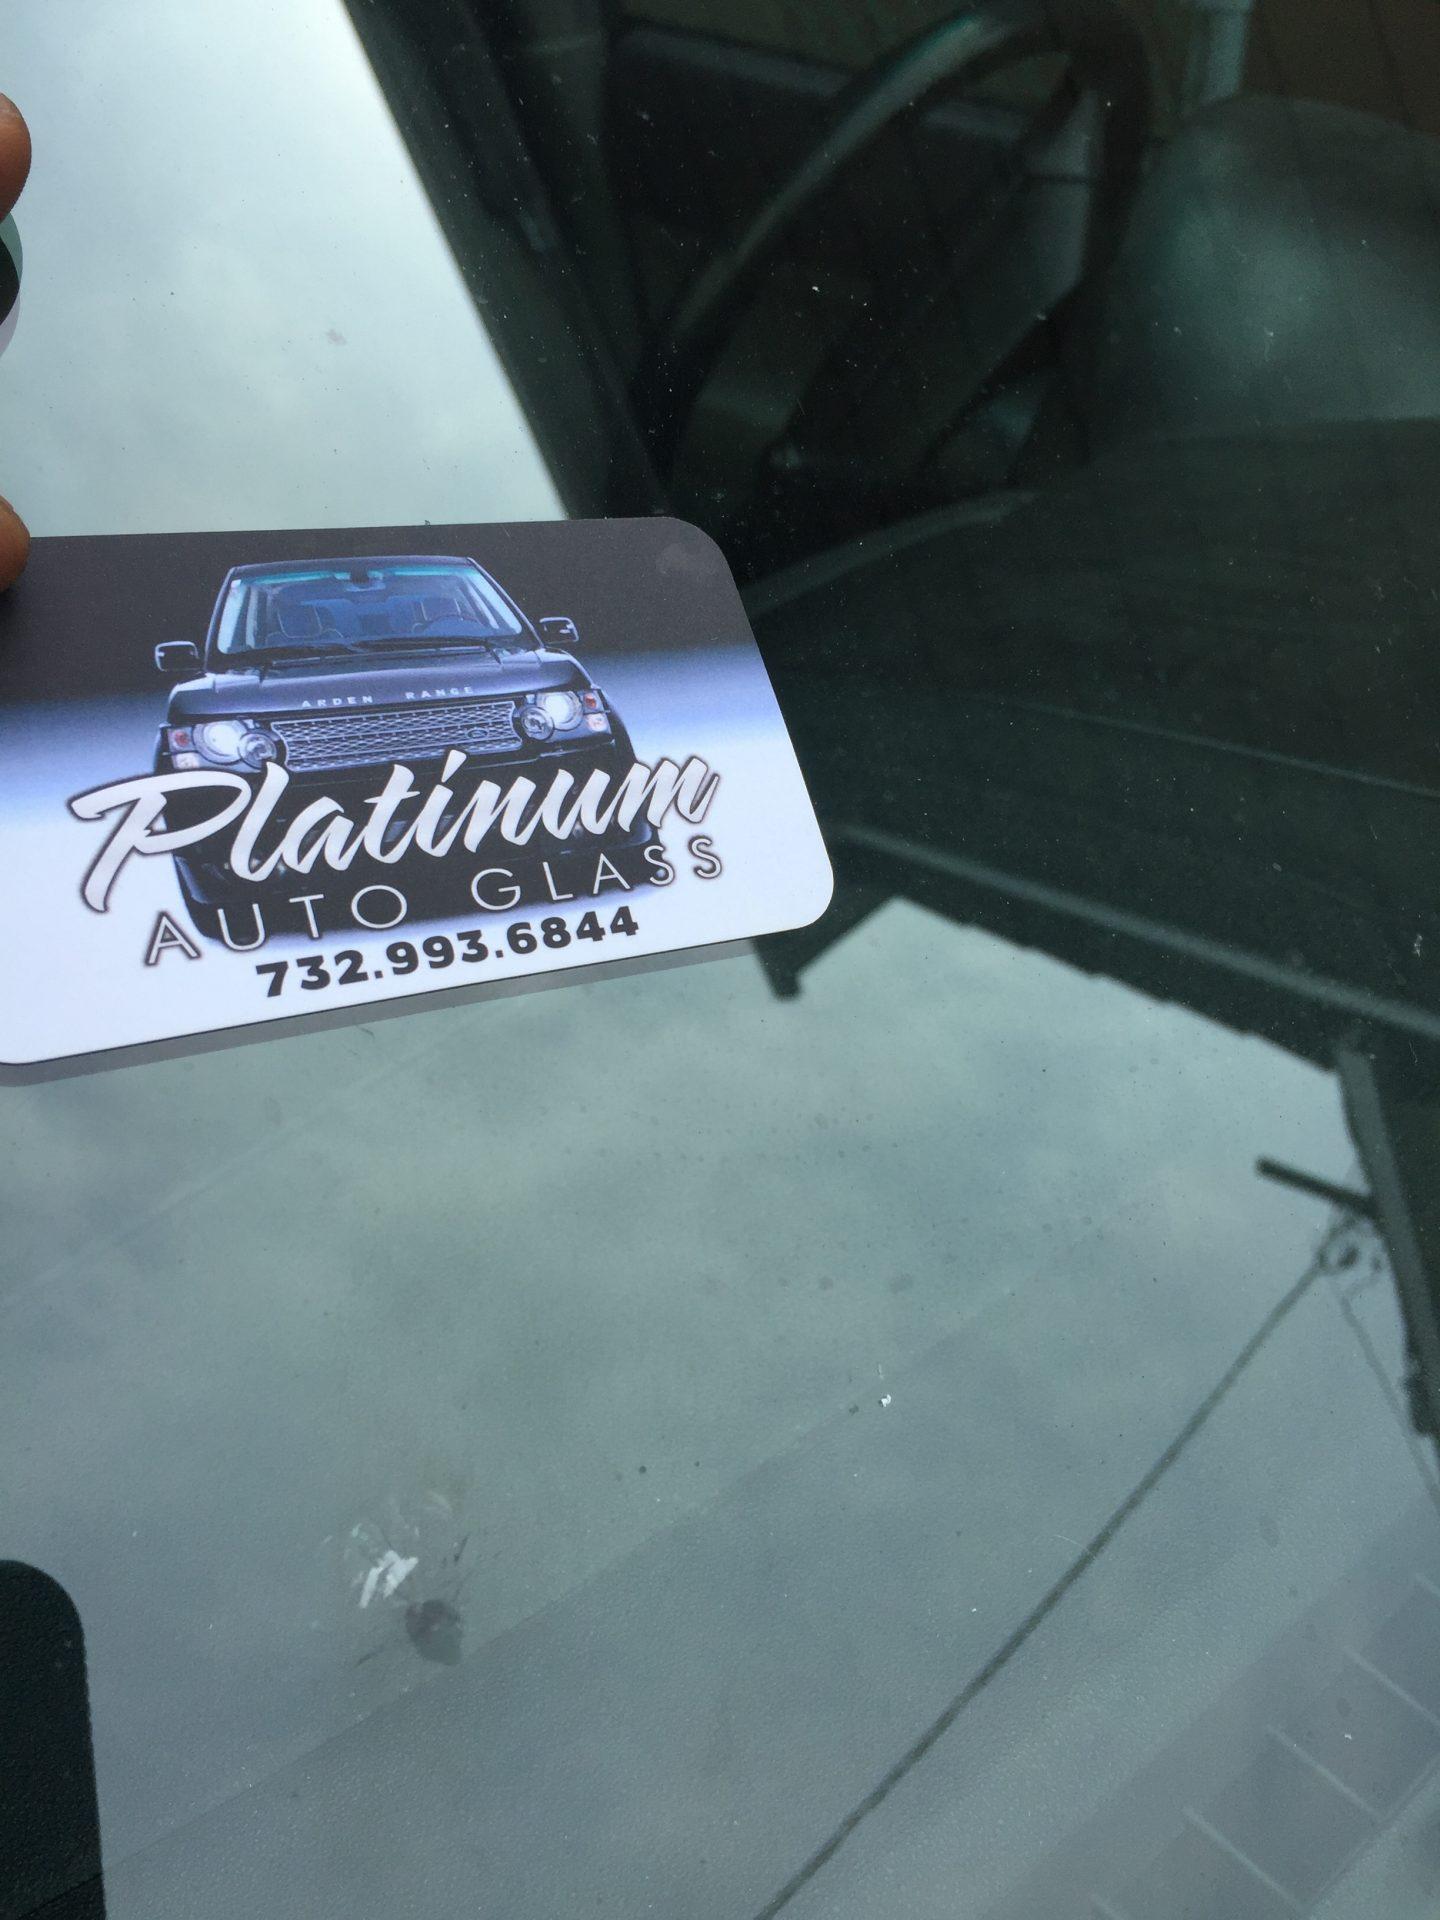 Mercedes Benz windshield stone chip fix Platinum Auto Glass Linden NJ